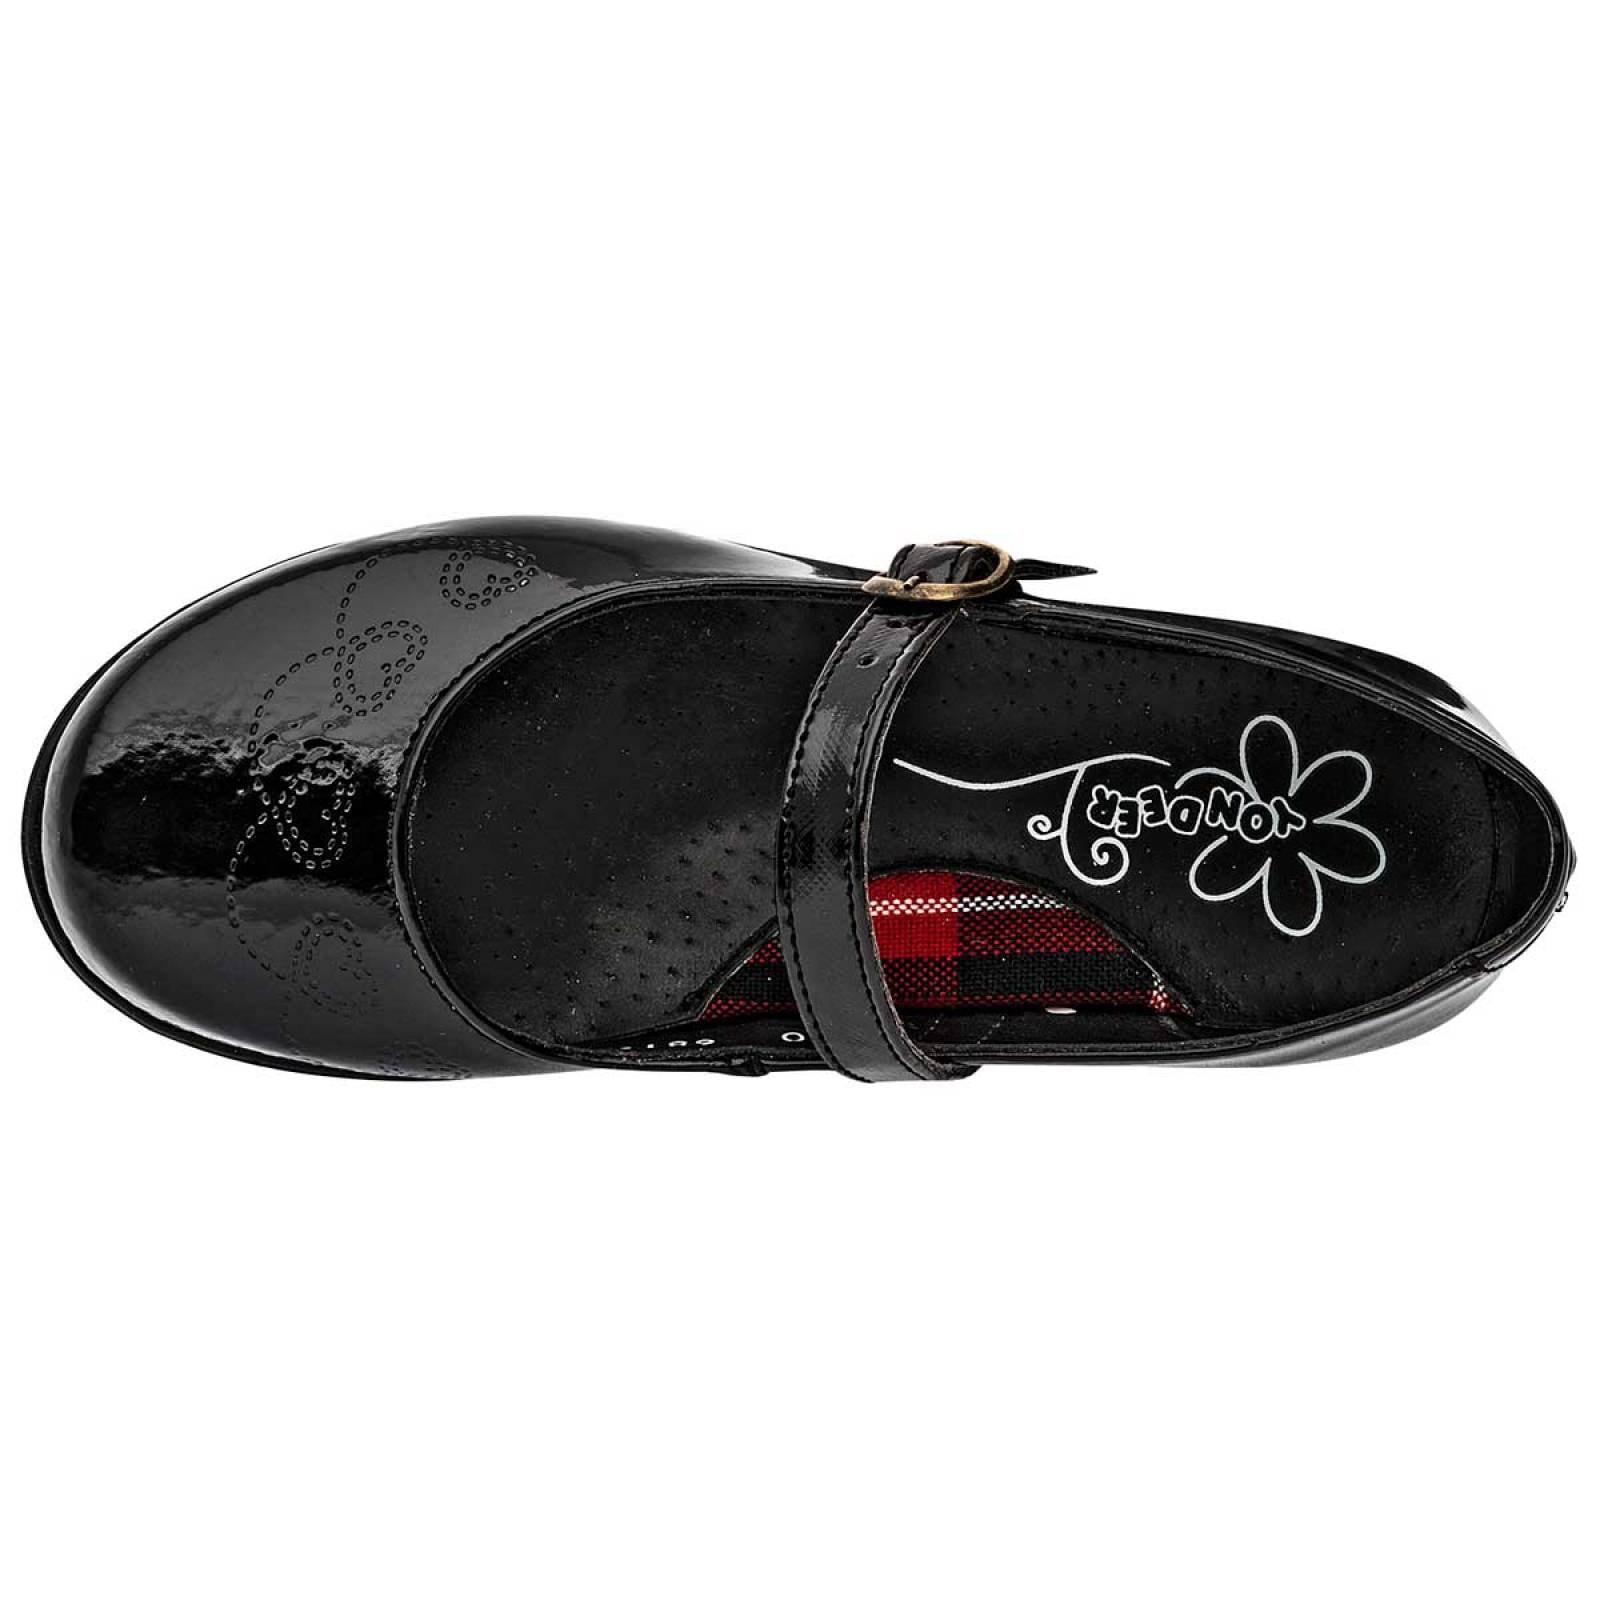 Yondeer Zapato Mujer Negro charol